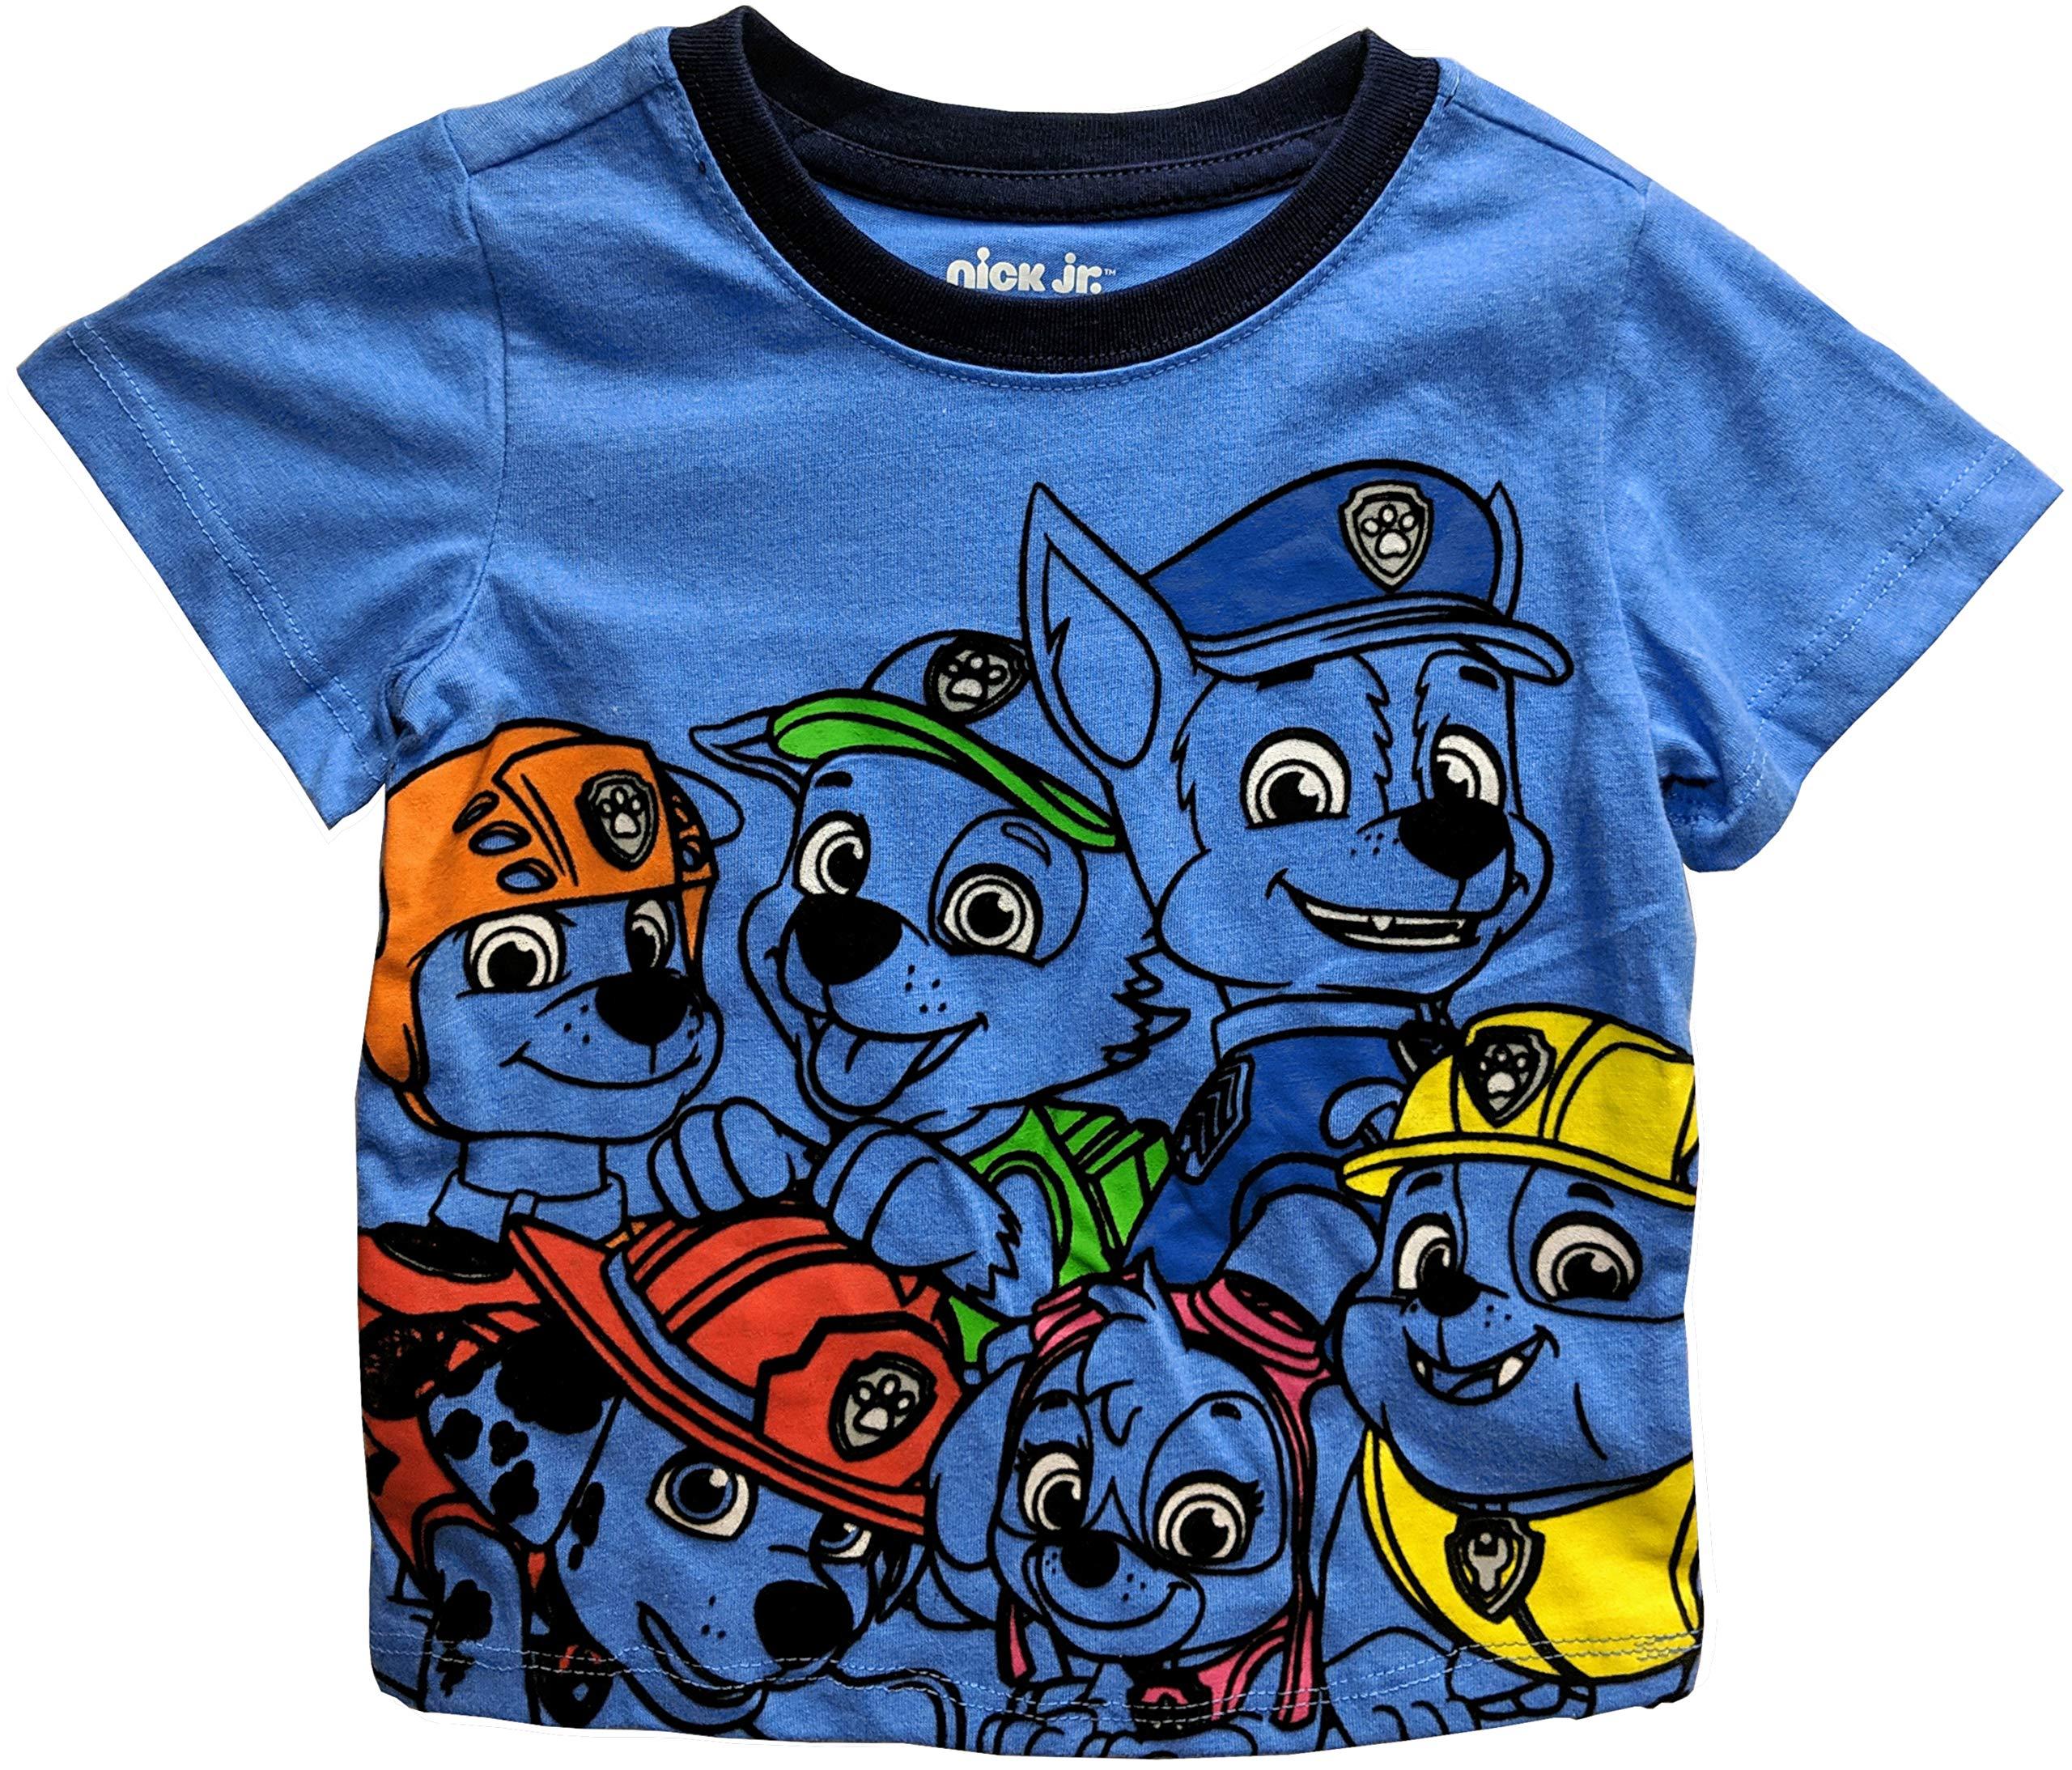 Paw Patrol Little Boys' Toddler Group T-Shirt